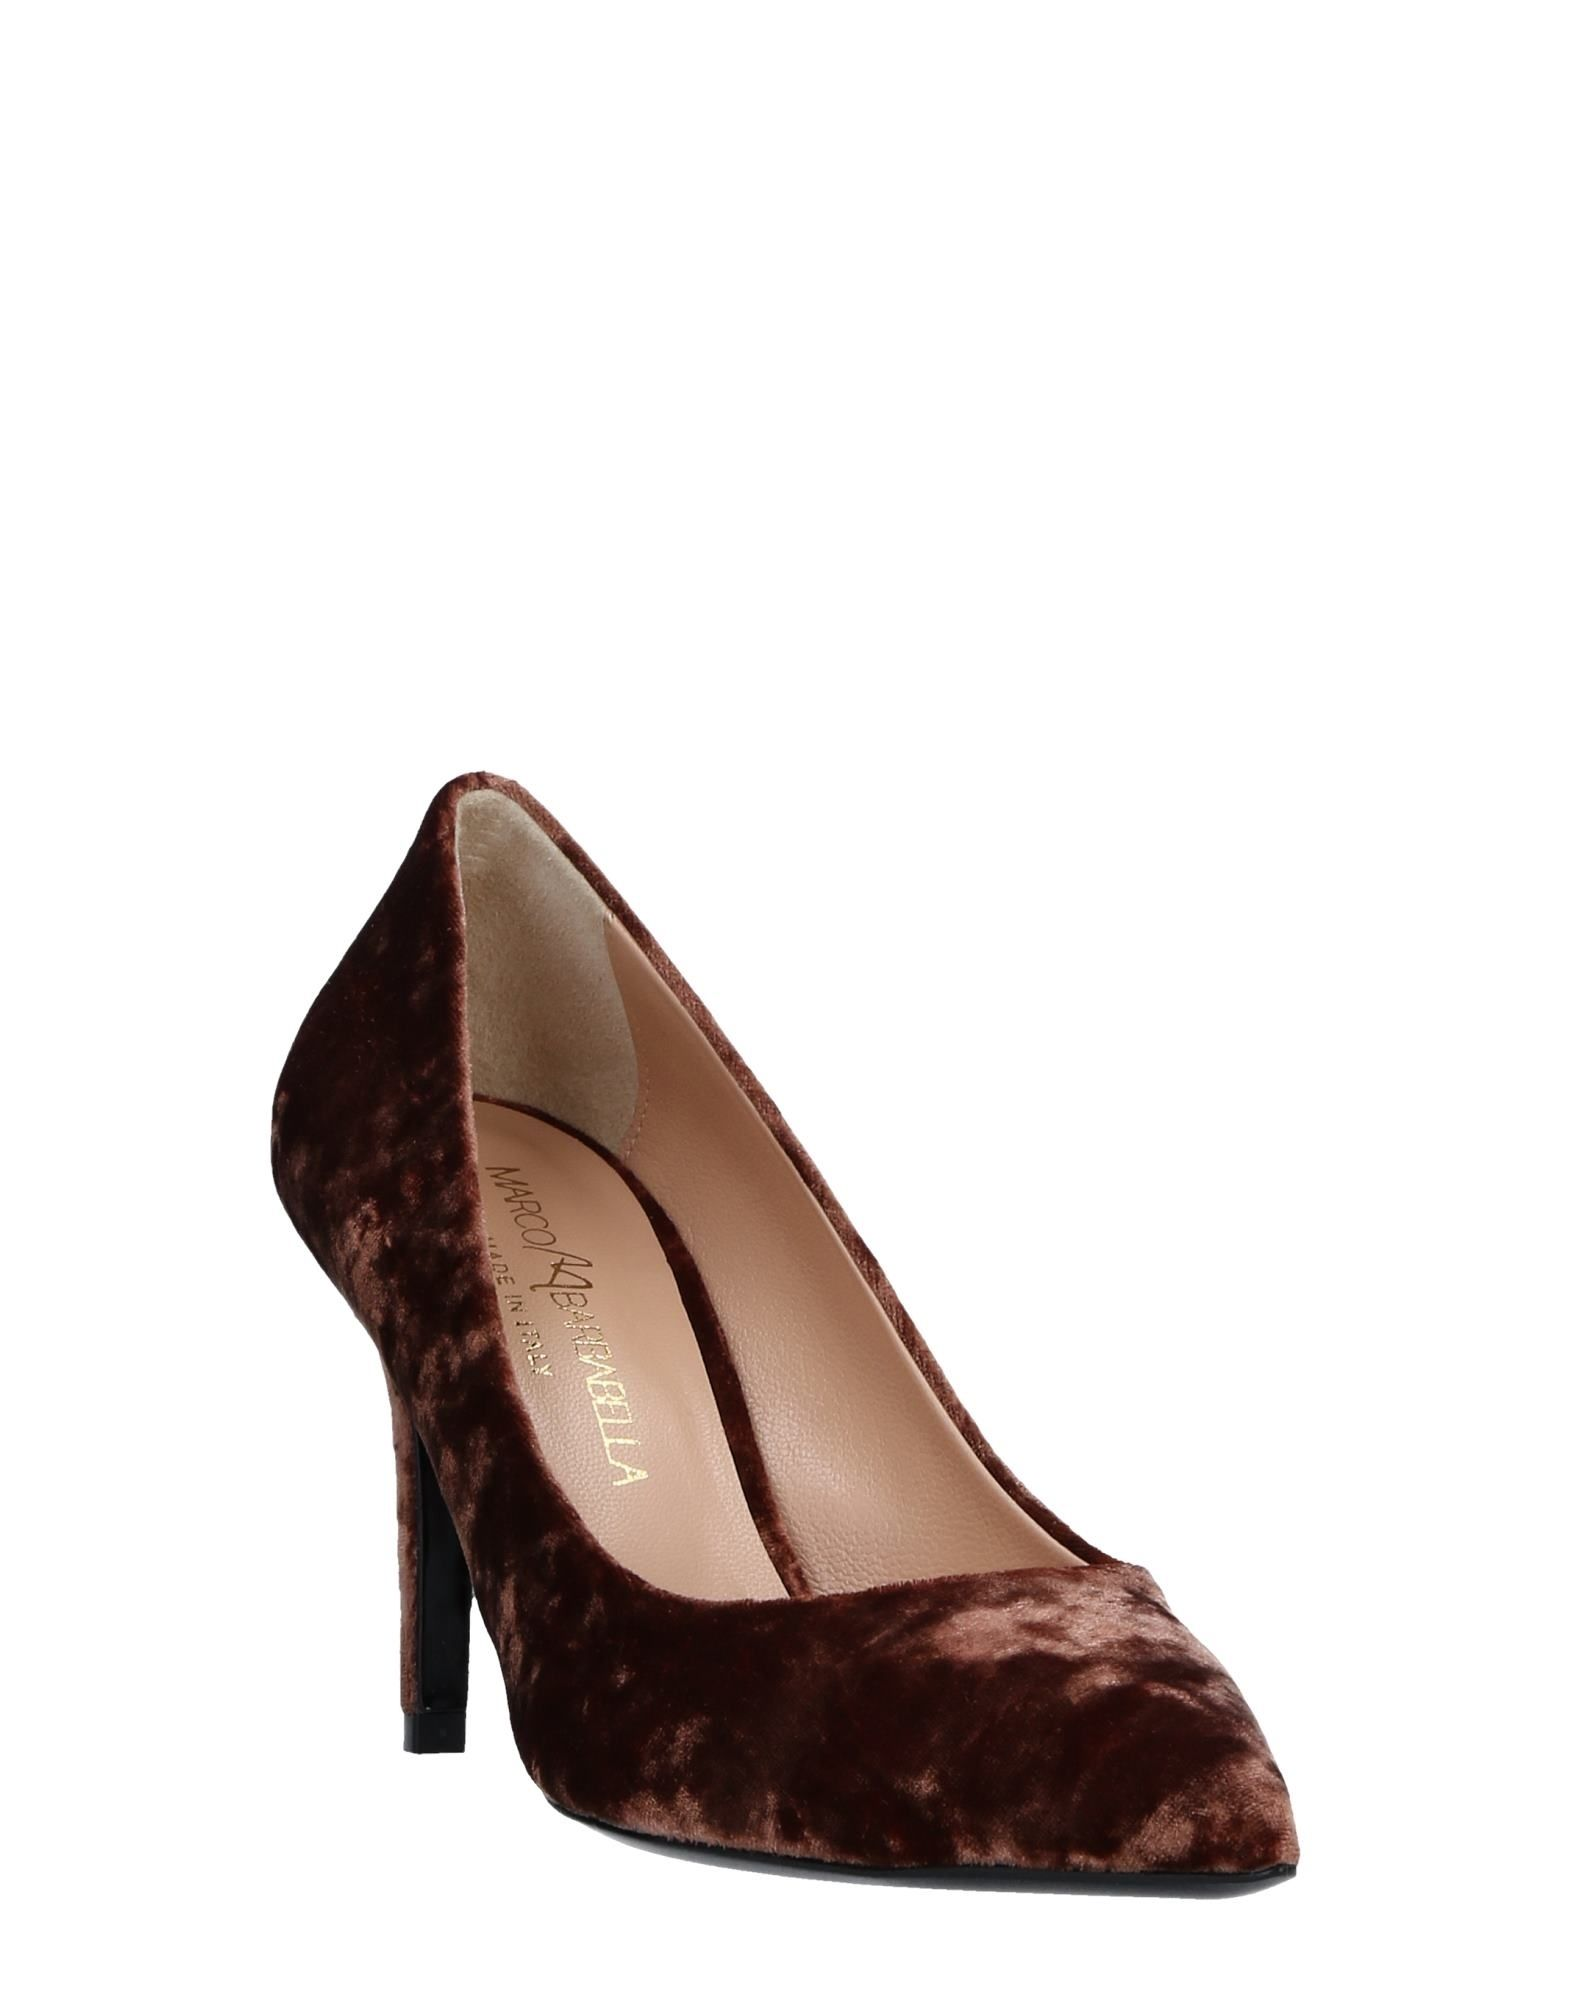 Marco Barbabella Pumps aussehende Damen 11515991VHGut aussehende Pumps strapazierfähige Schuhe 3fad41